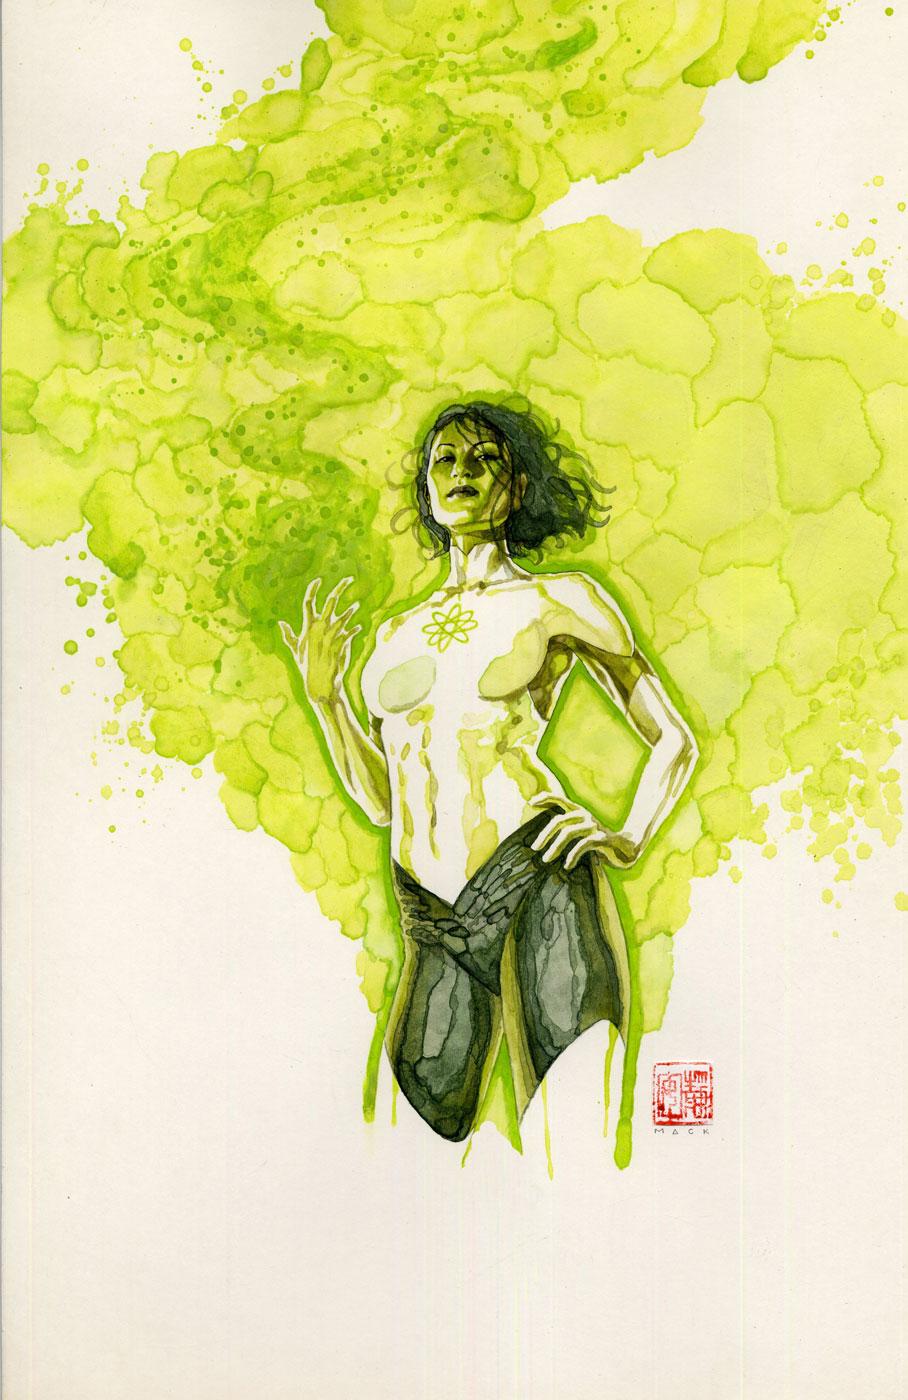 Green Lantern (Jade)